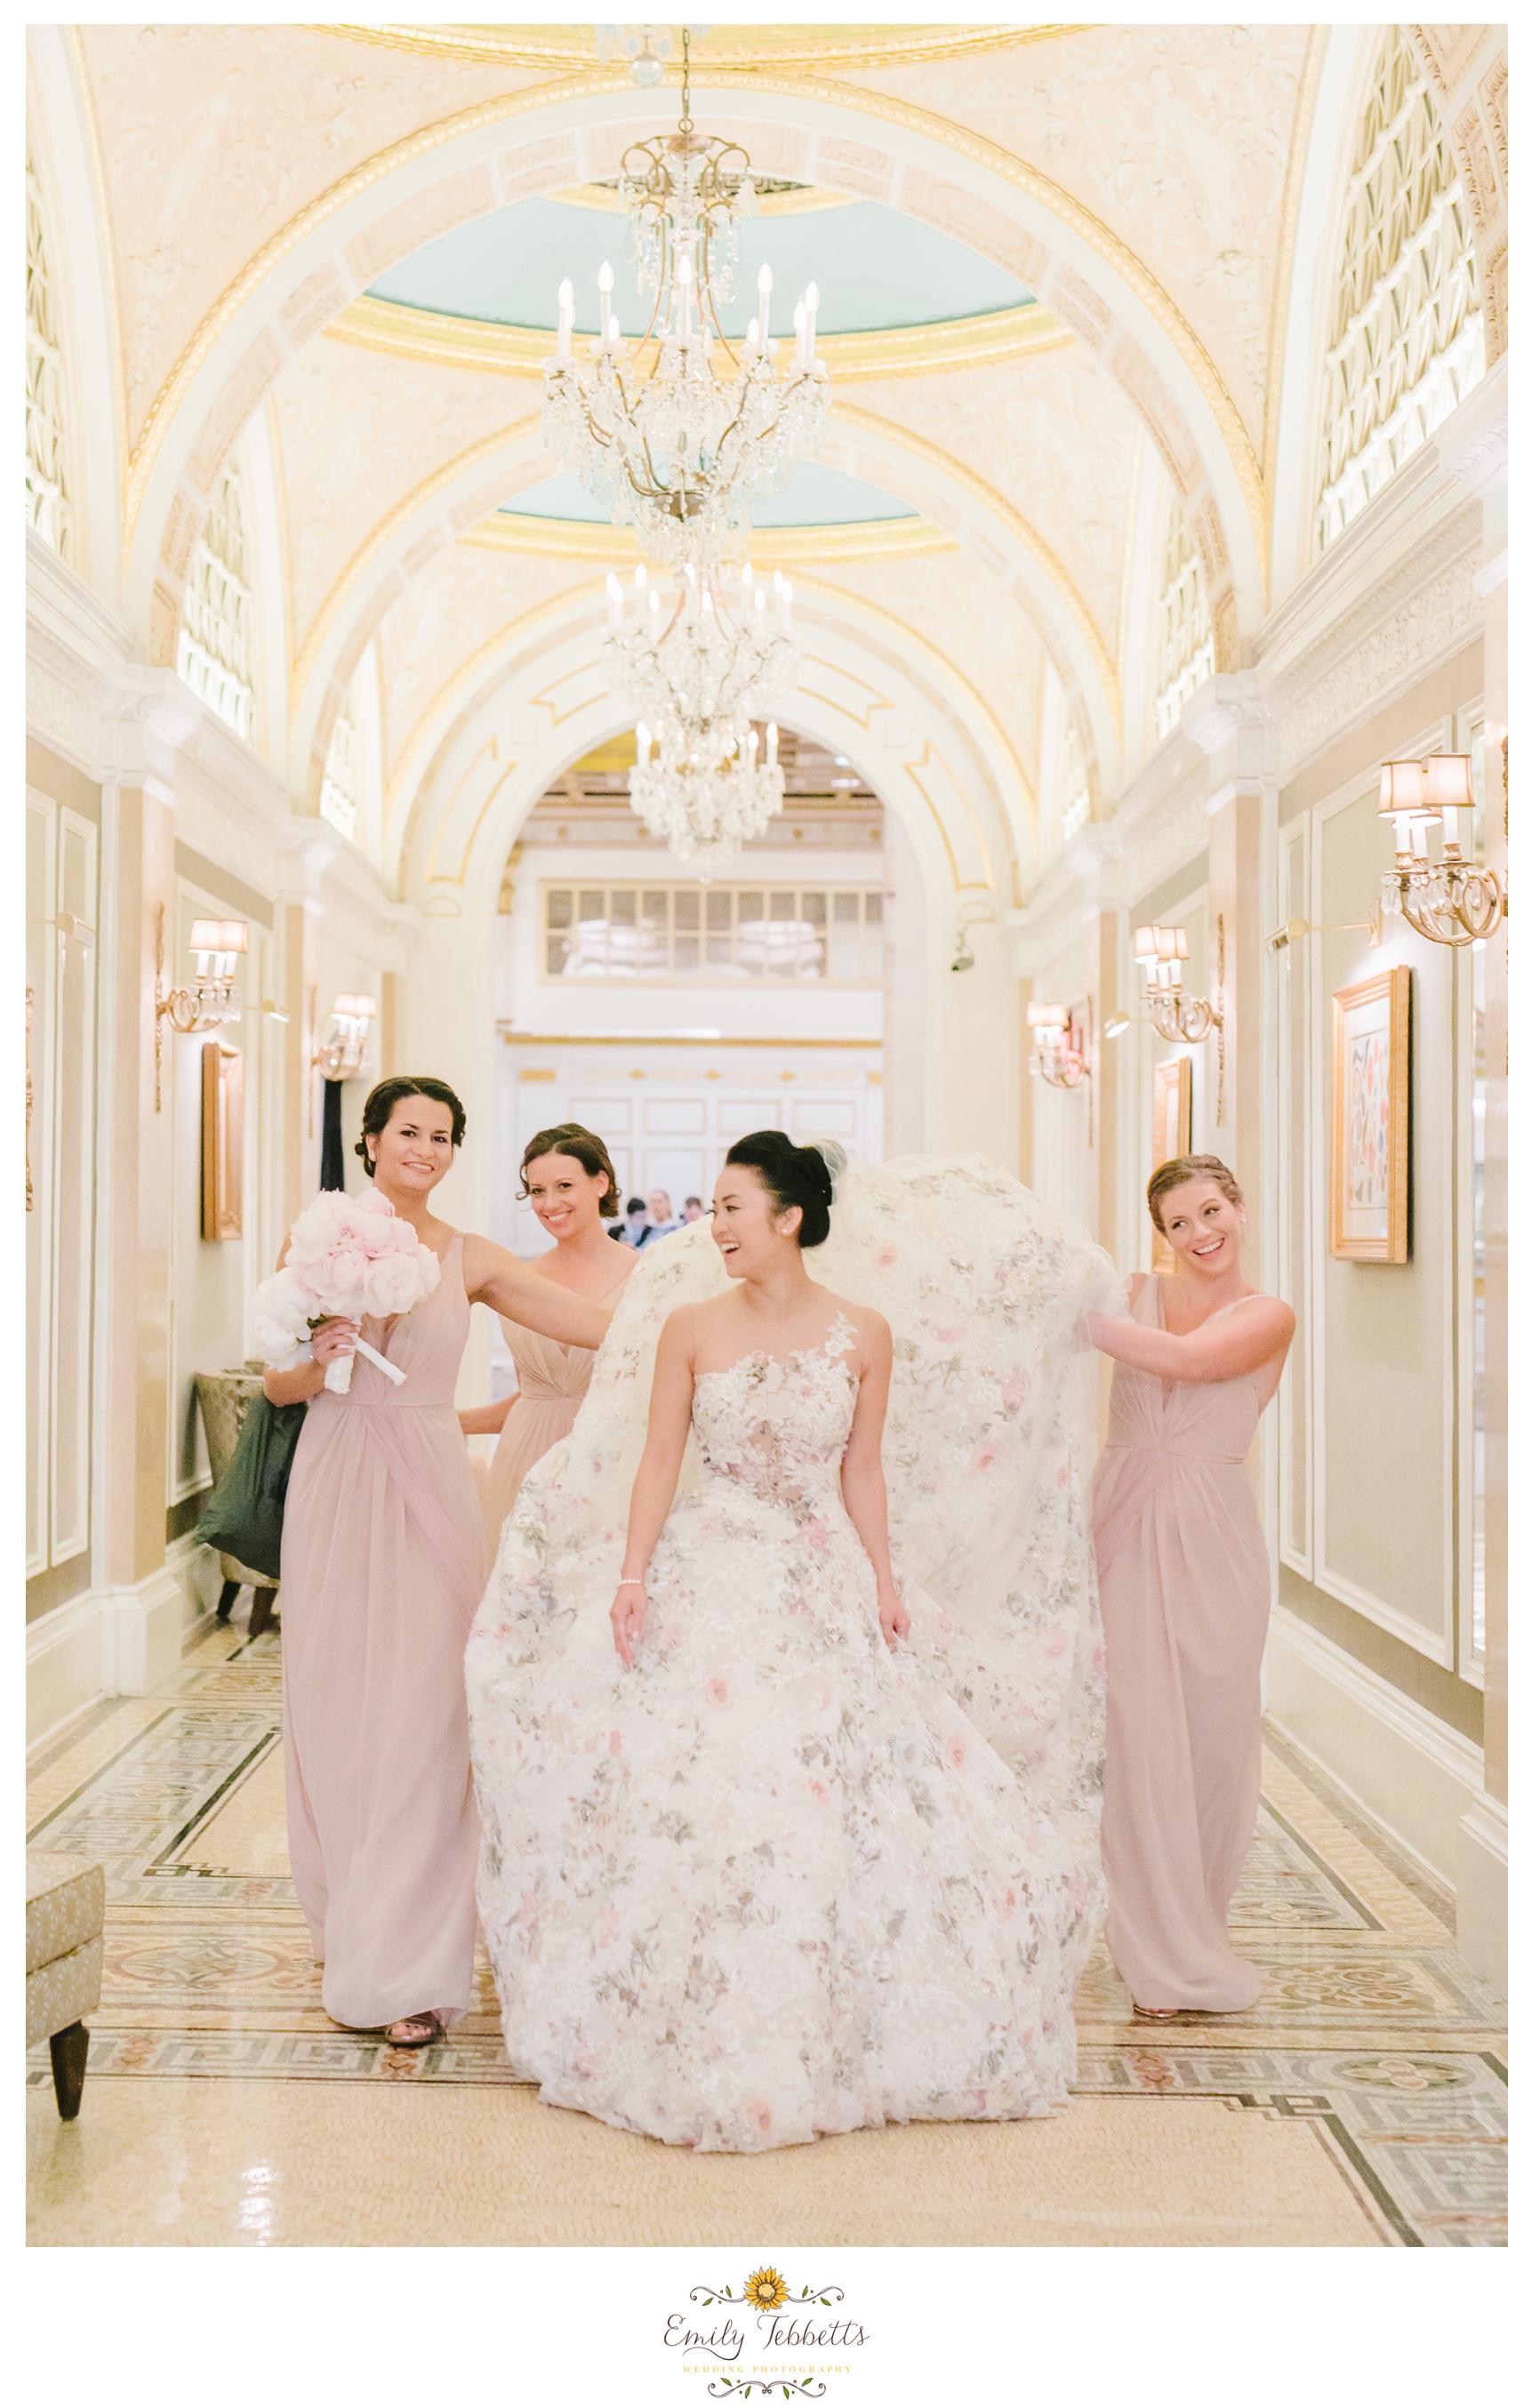 Boston Public Library BPL Wedding Emily Tebbetts Photography - Kaori + John-2.jpg